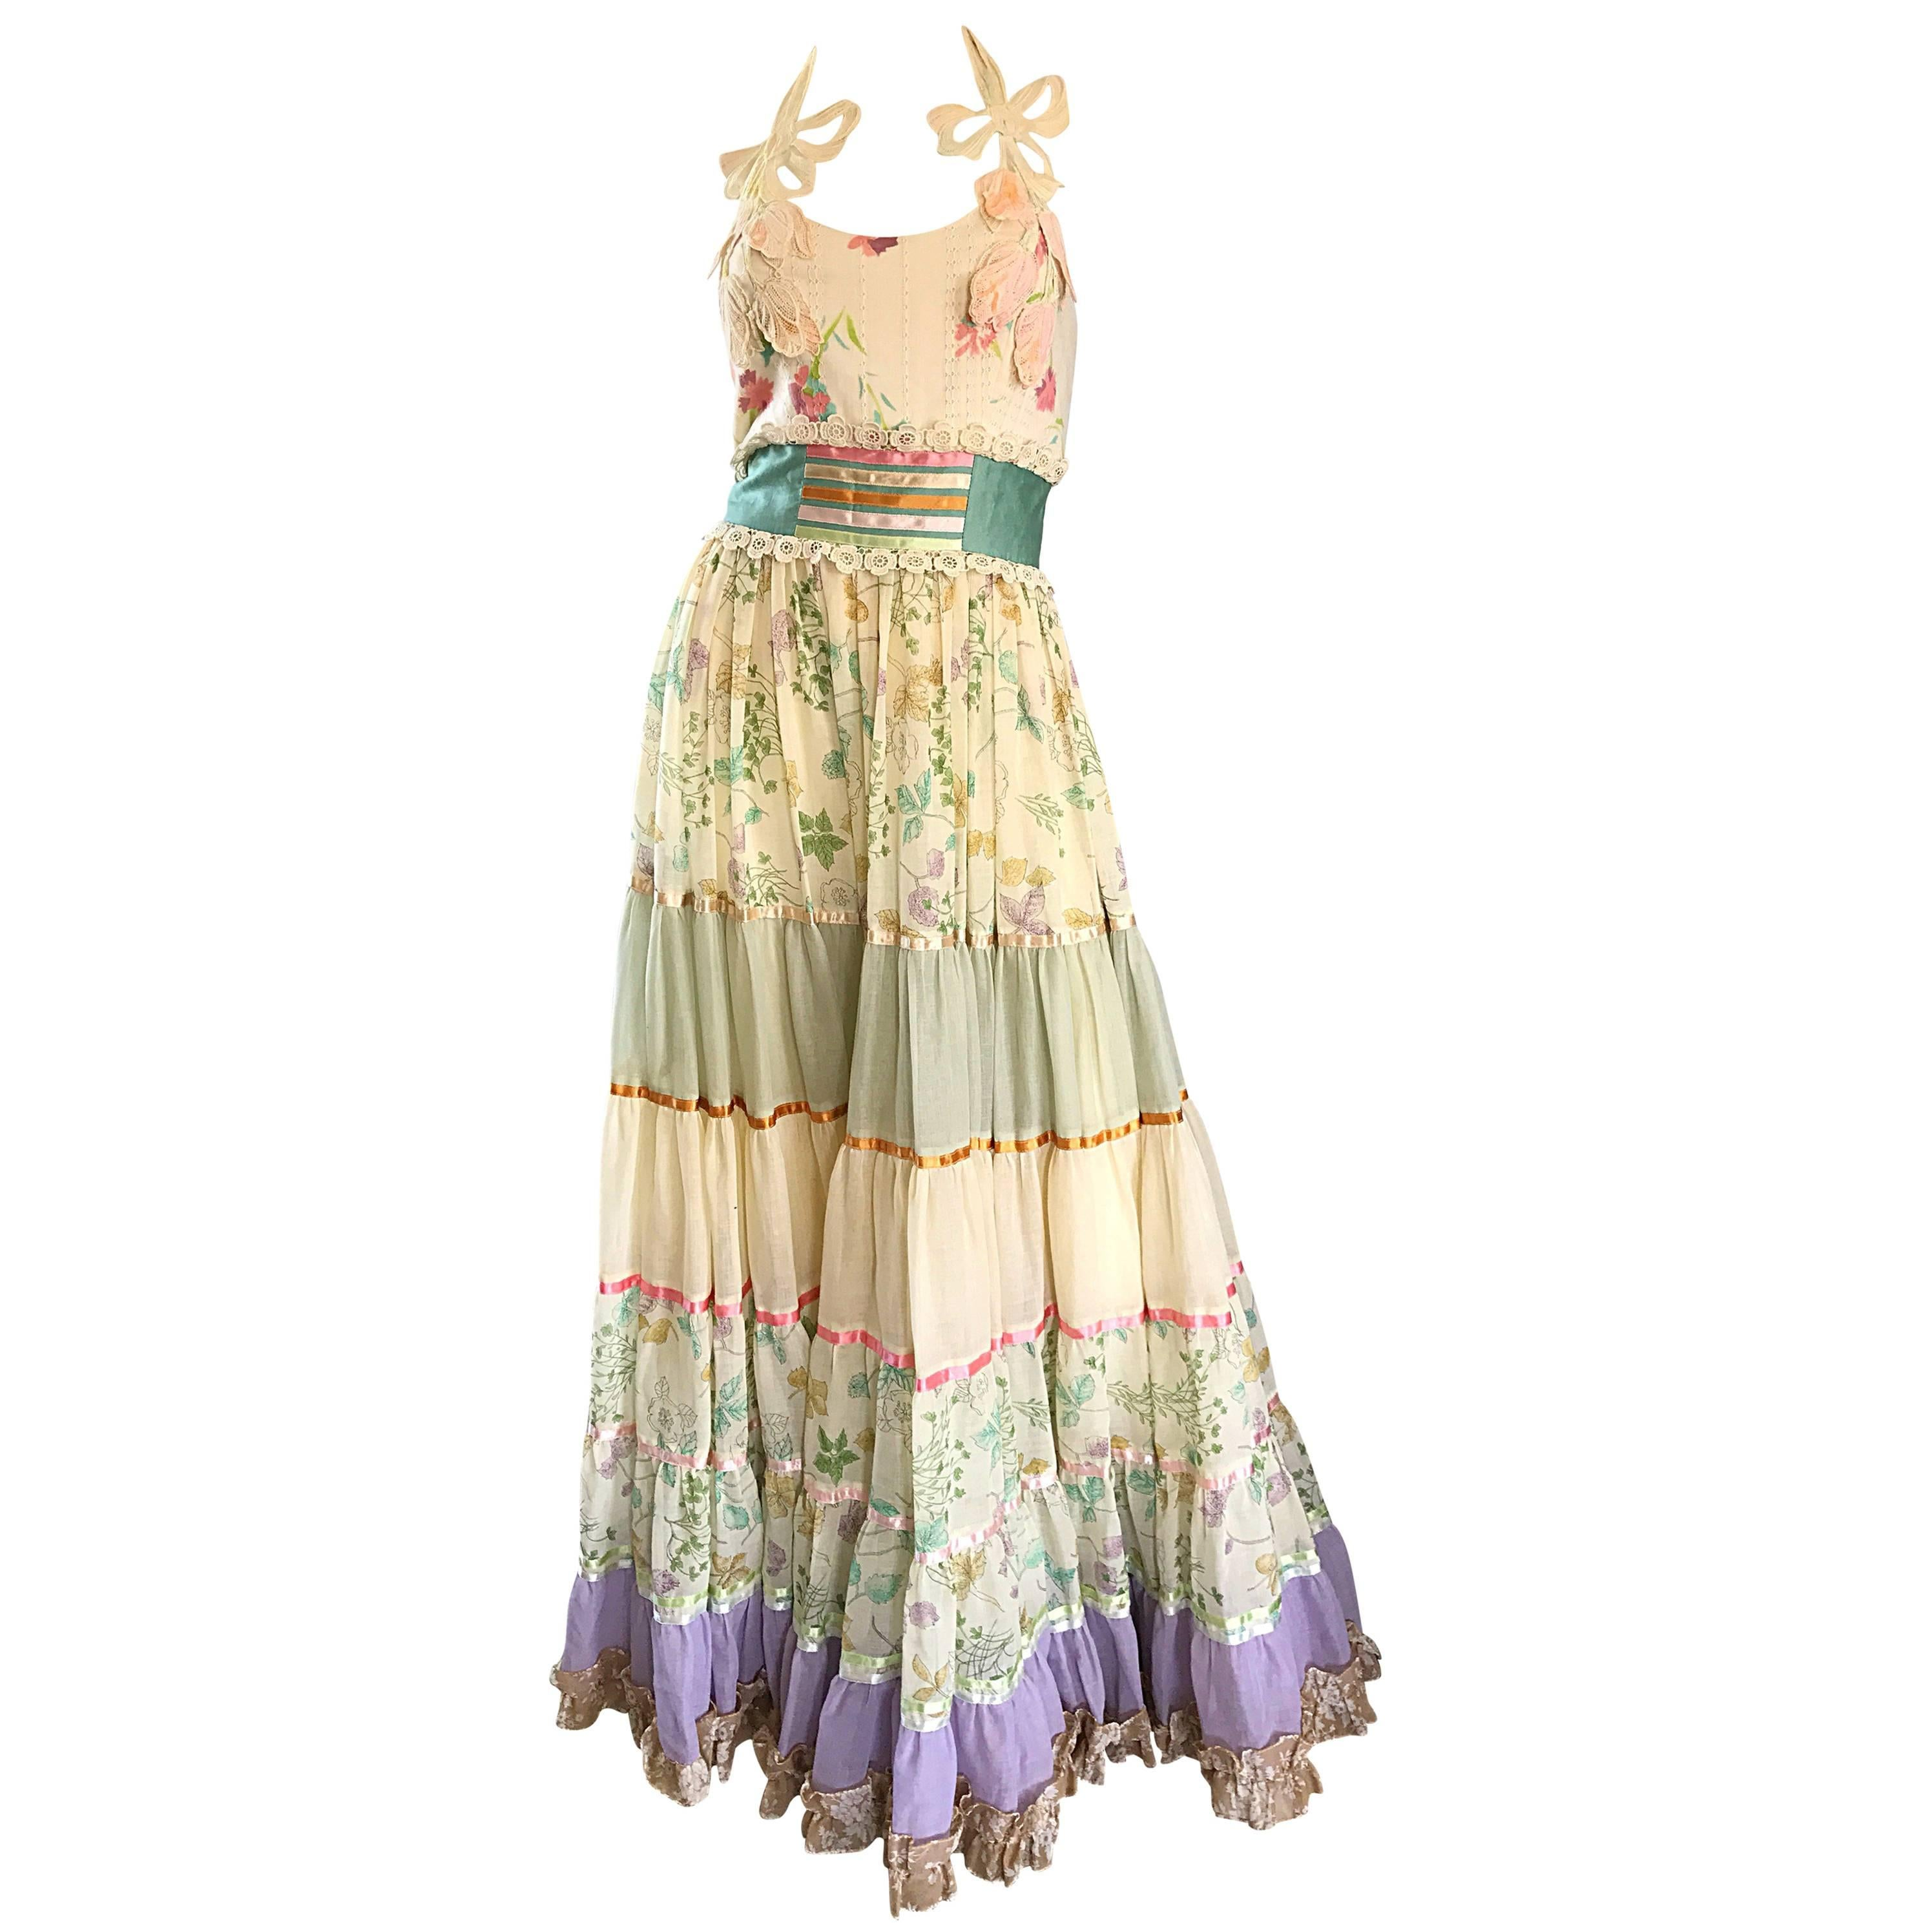 Giorgio di Sant Angelo Colorful Cotton Voile 70s Couture Maxi Dress Gown